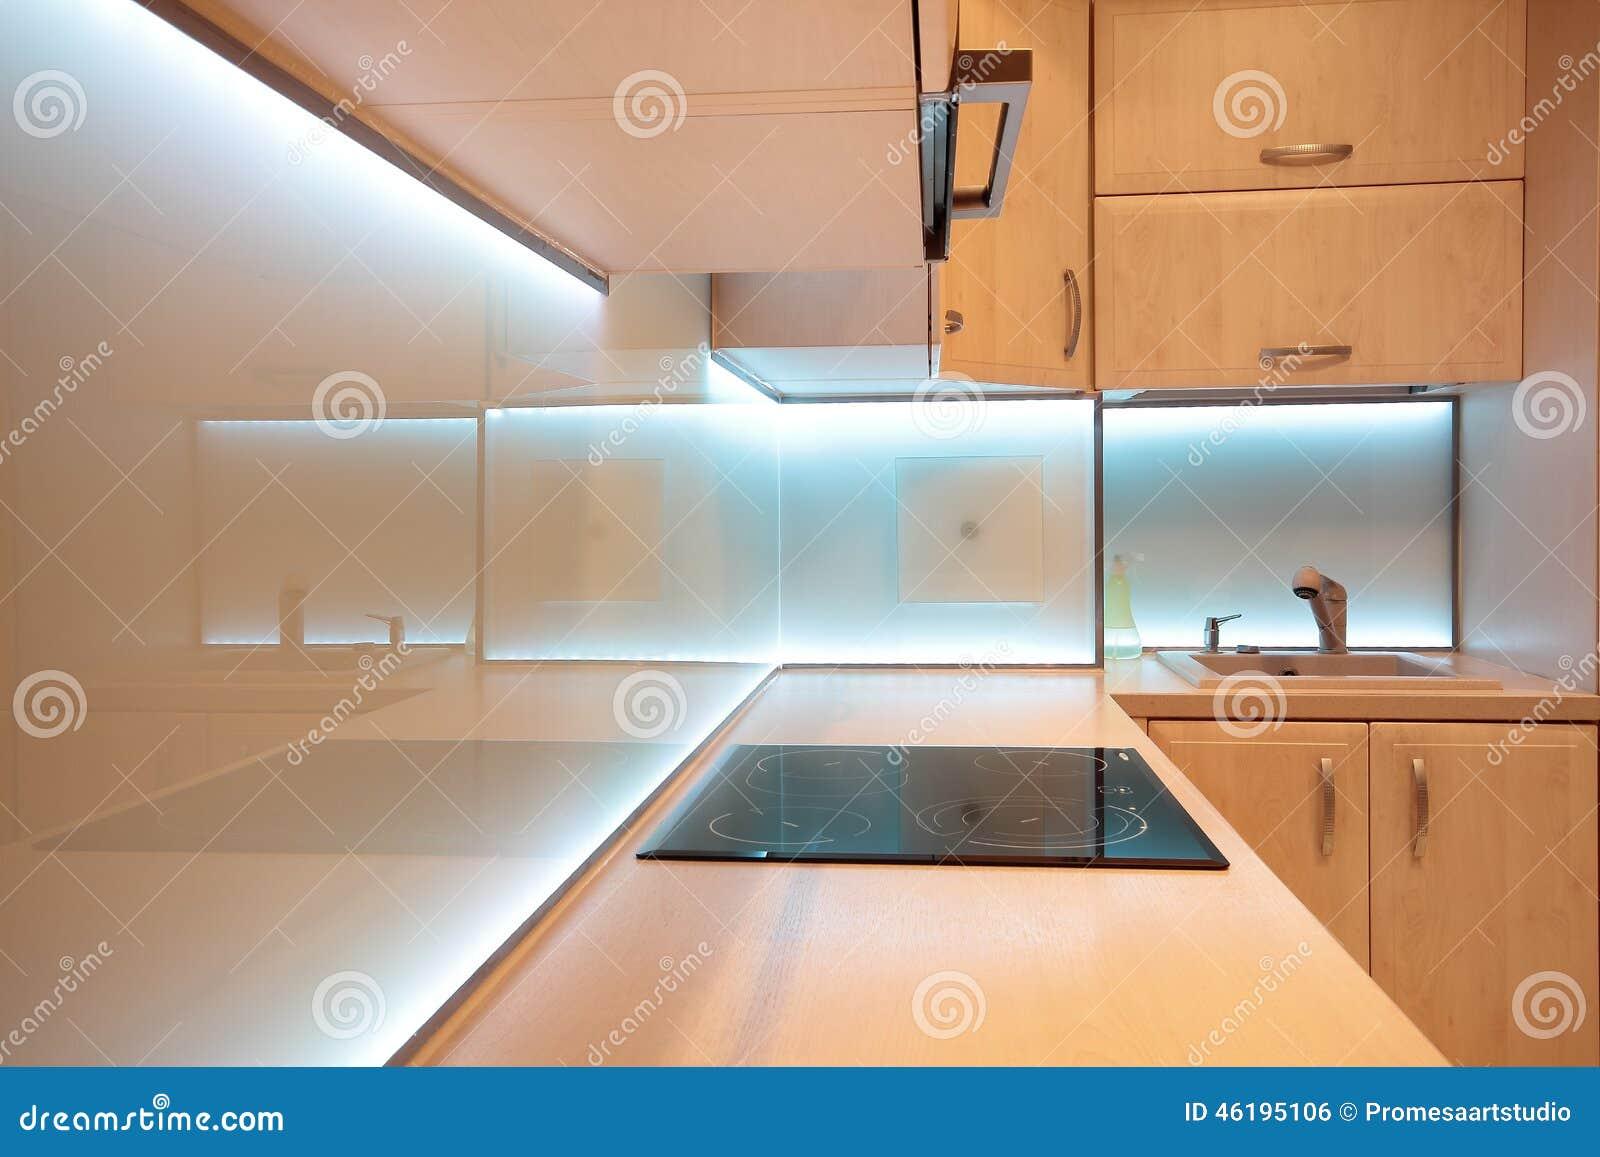 Cocina de lujo moderna con la iluminaci n blanca del led - Iluminacion cocina led ...